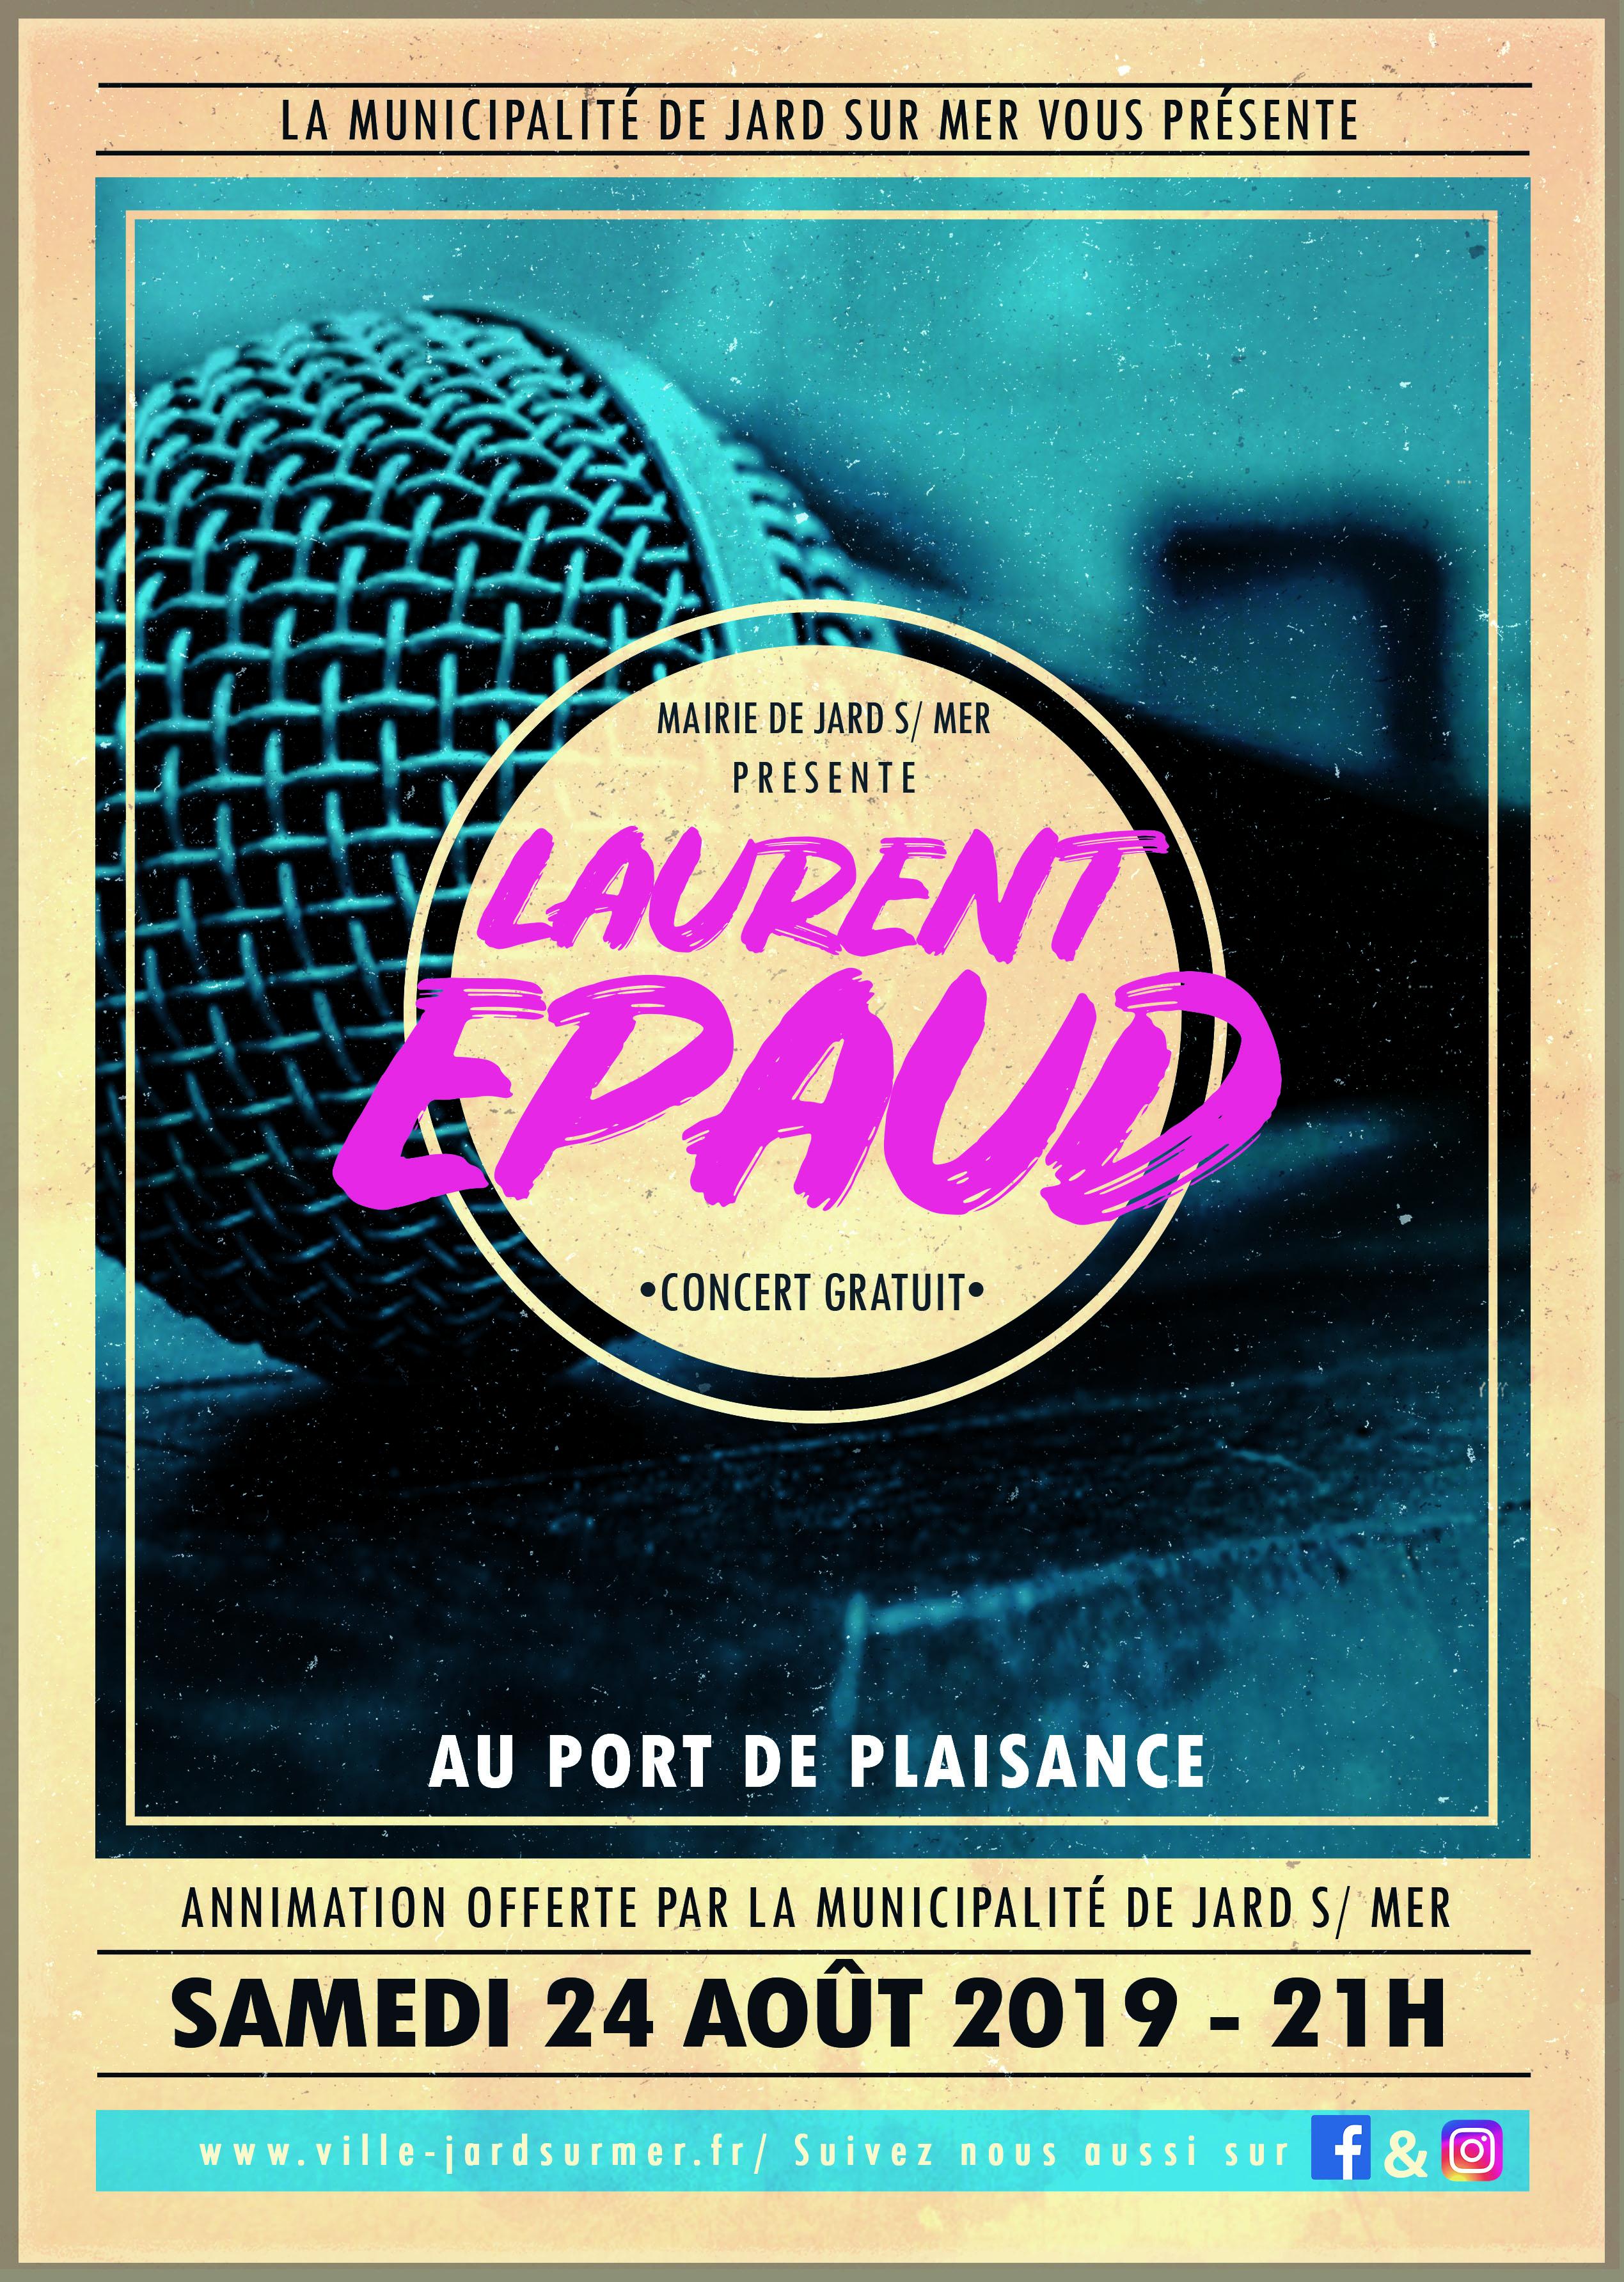 08.24 Laurent epaud